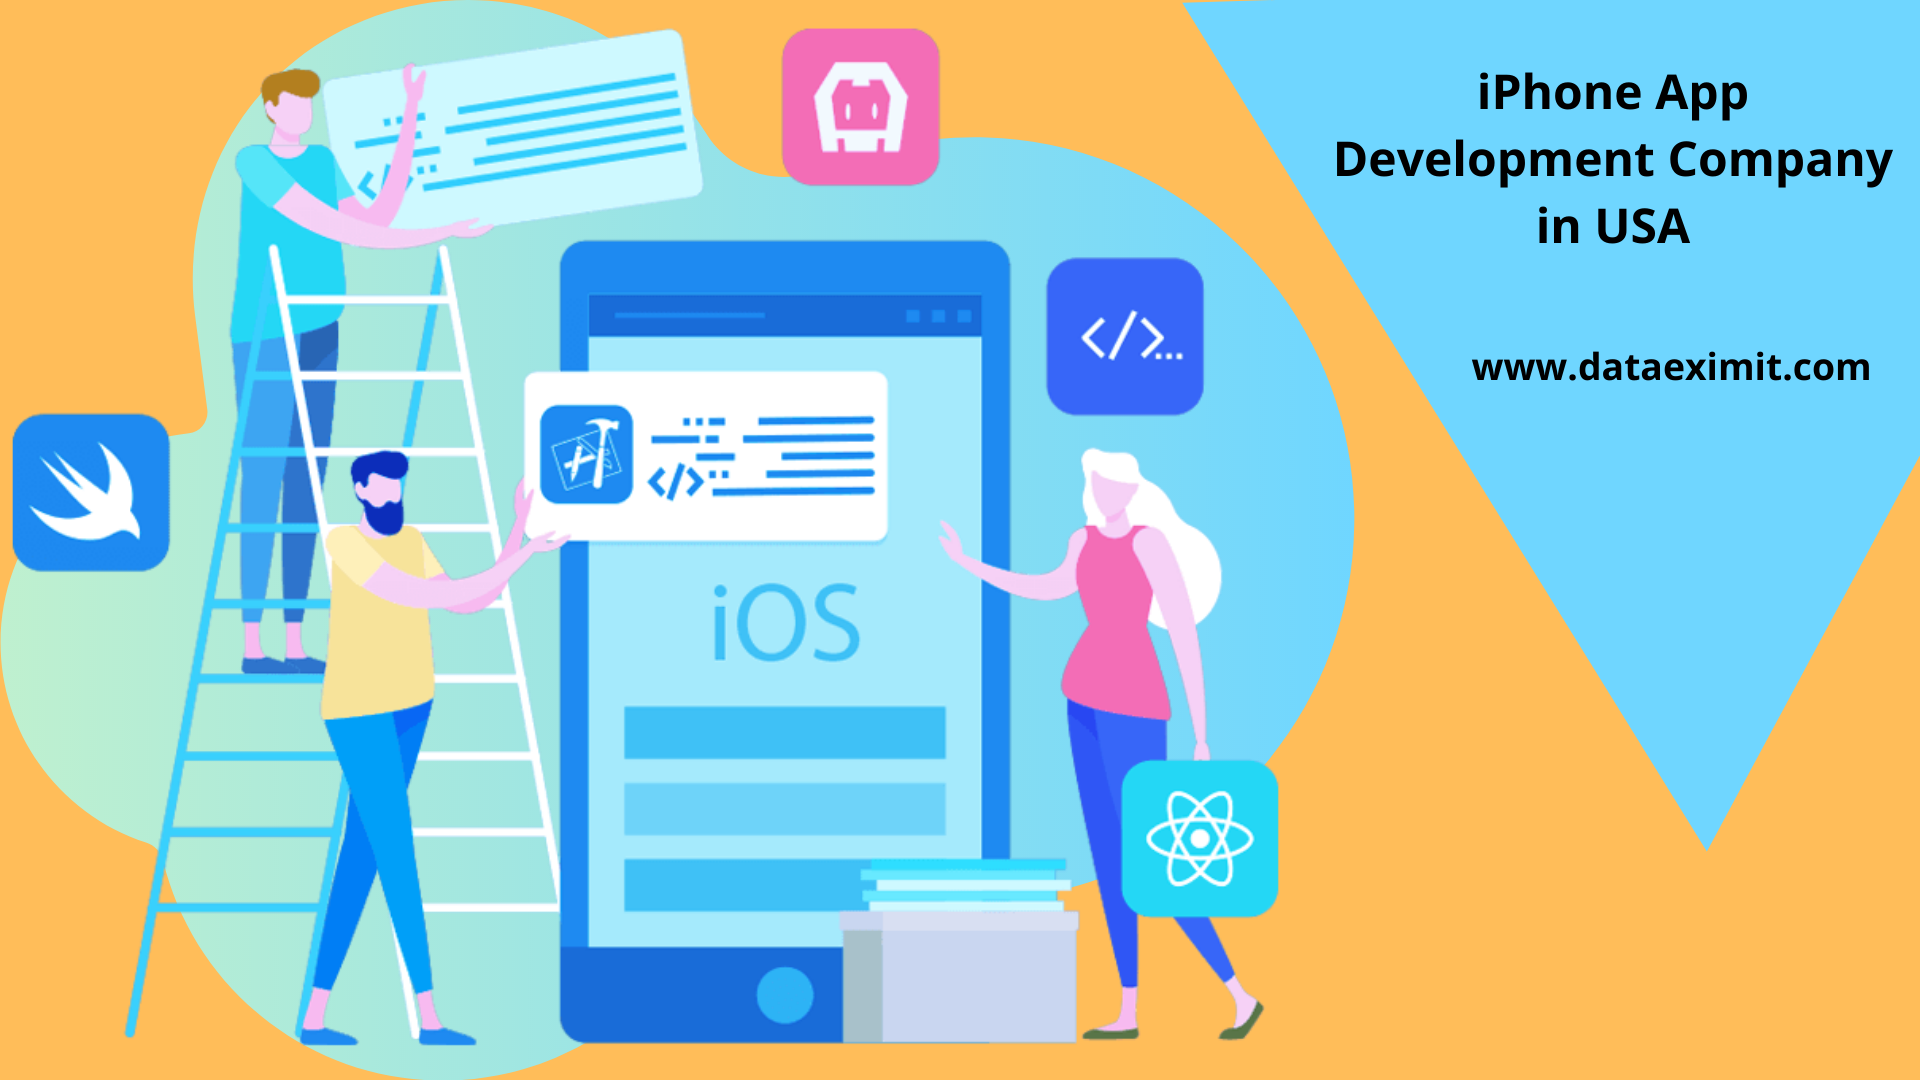 iPhone App Development Company USA